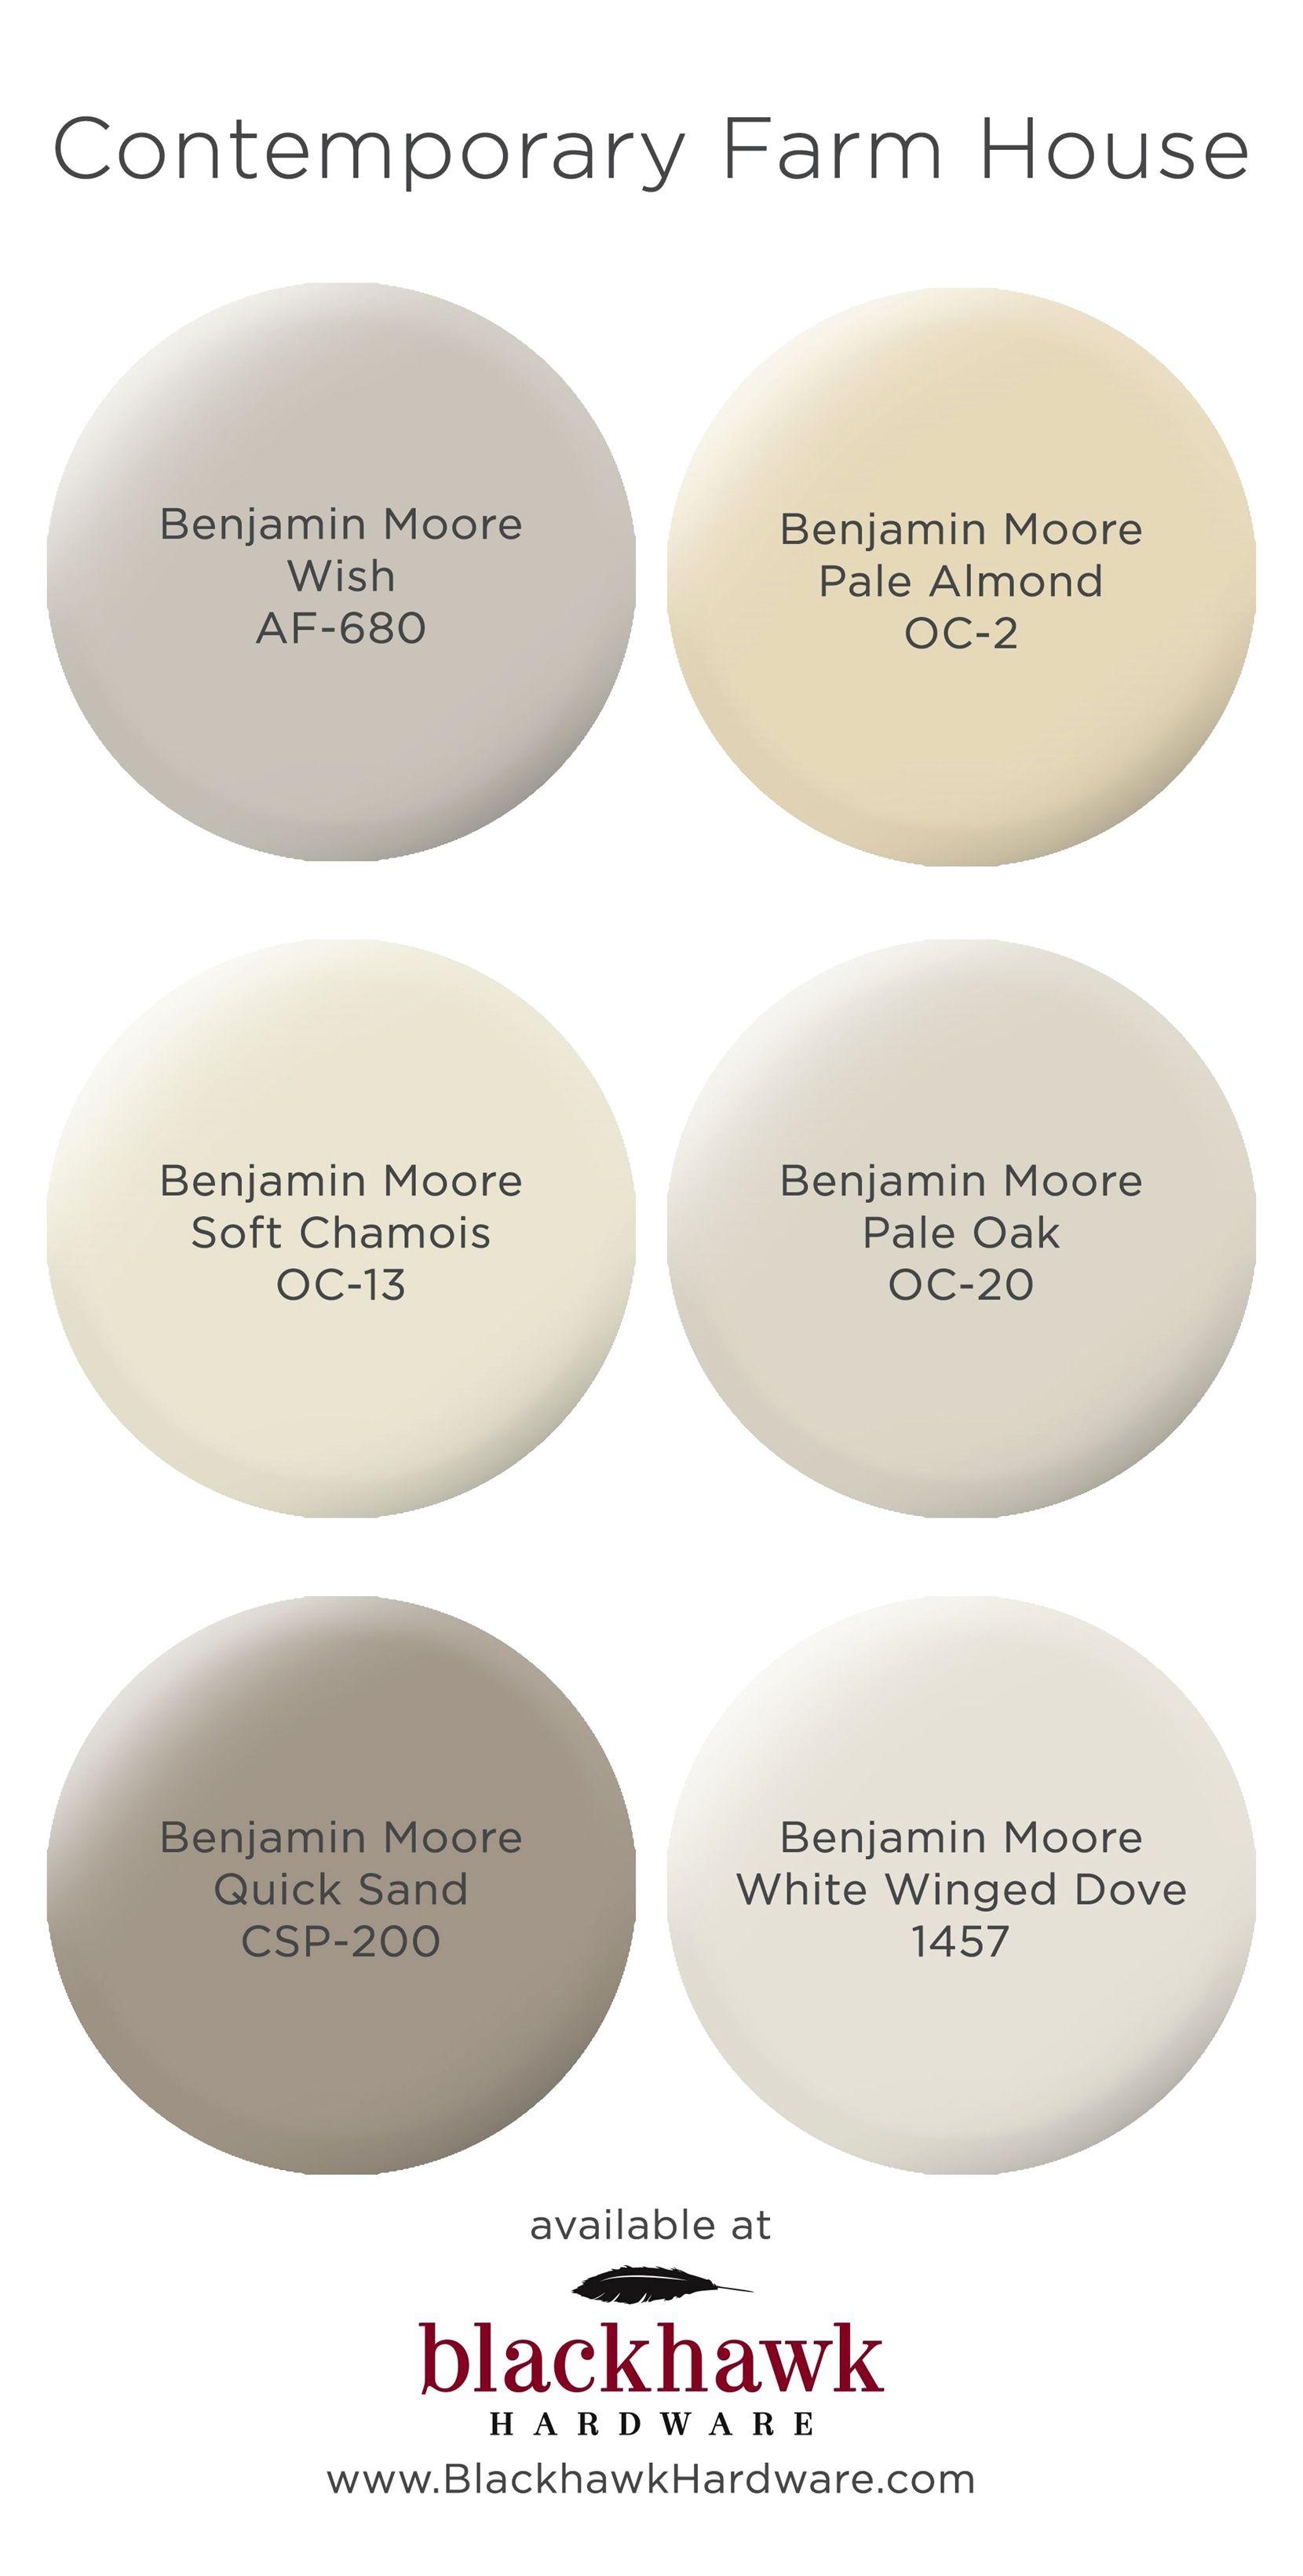 Contemporary farm house interior paint colors by benjamin moore kitcheninteriordesign